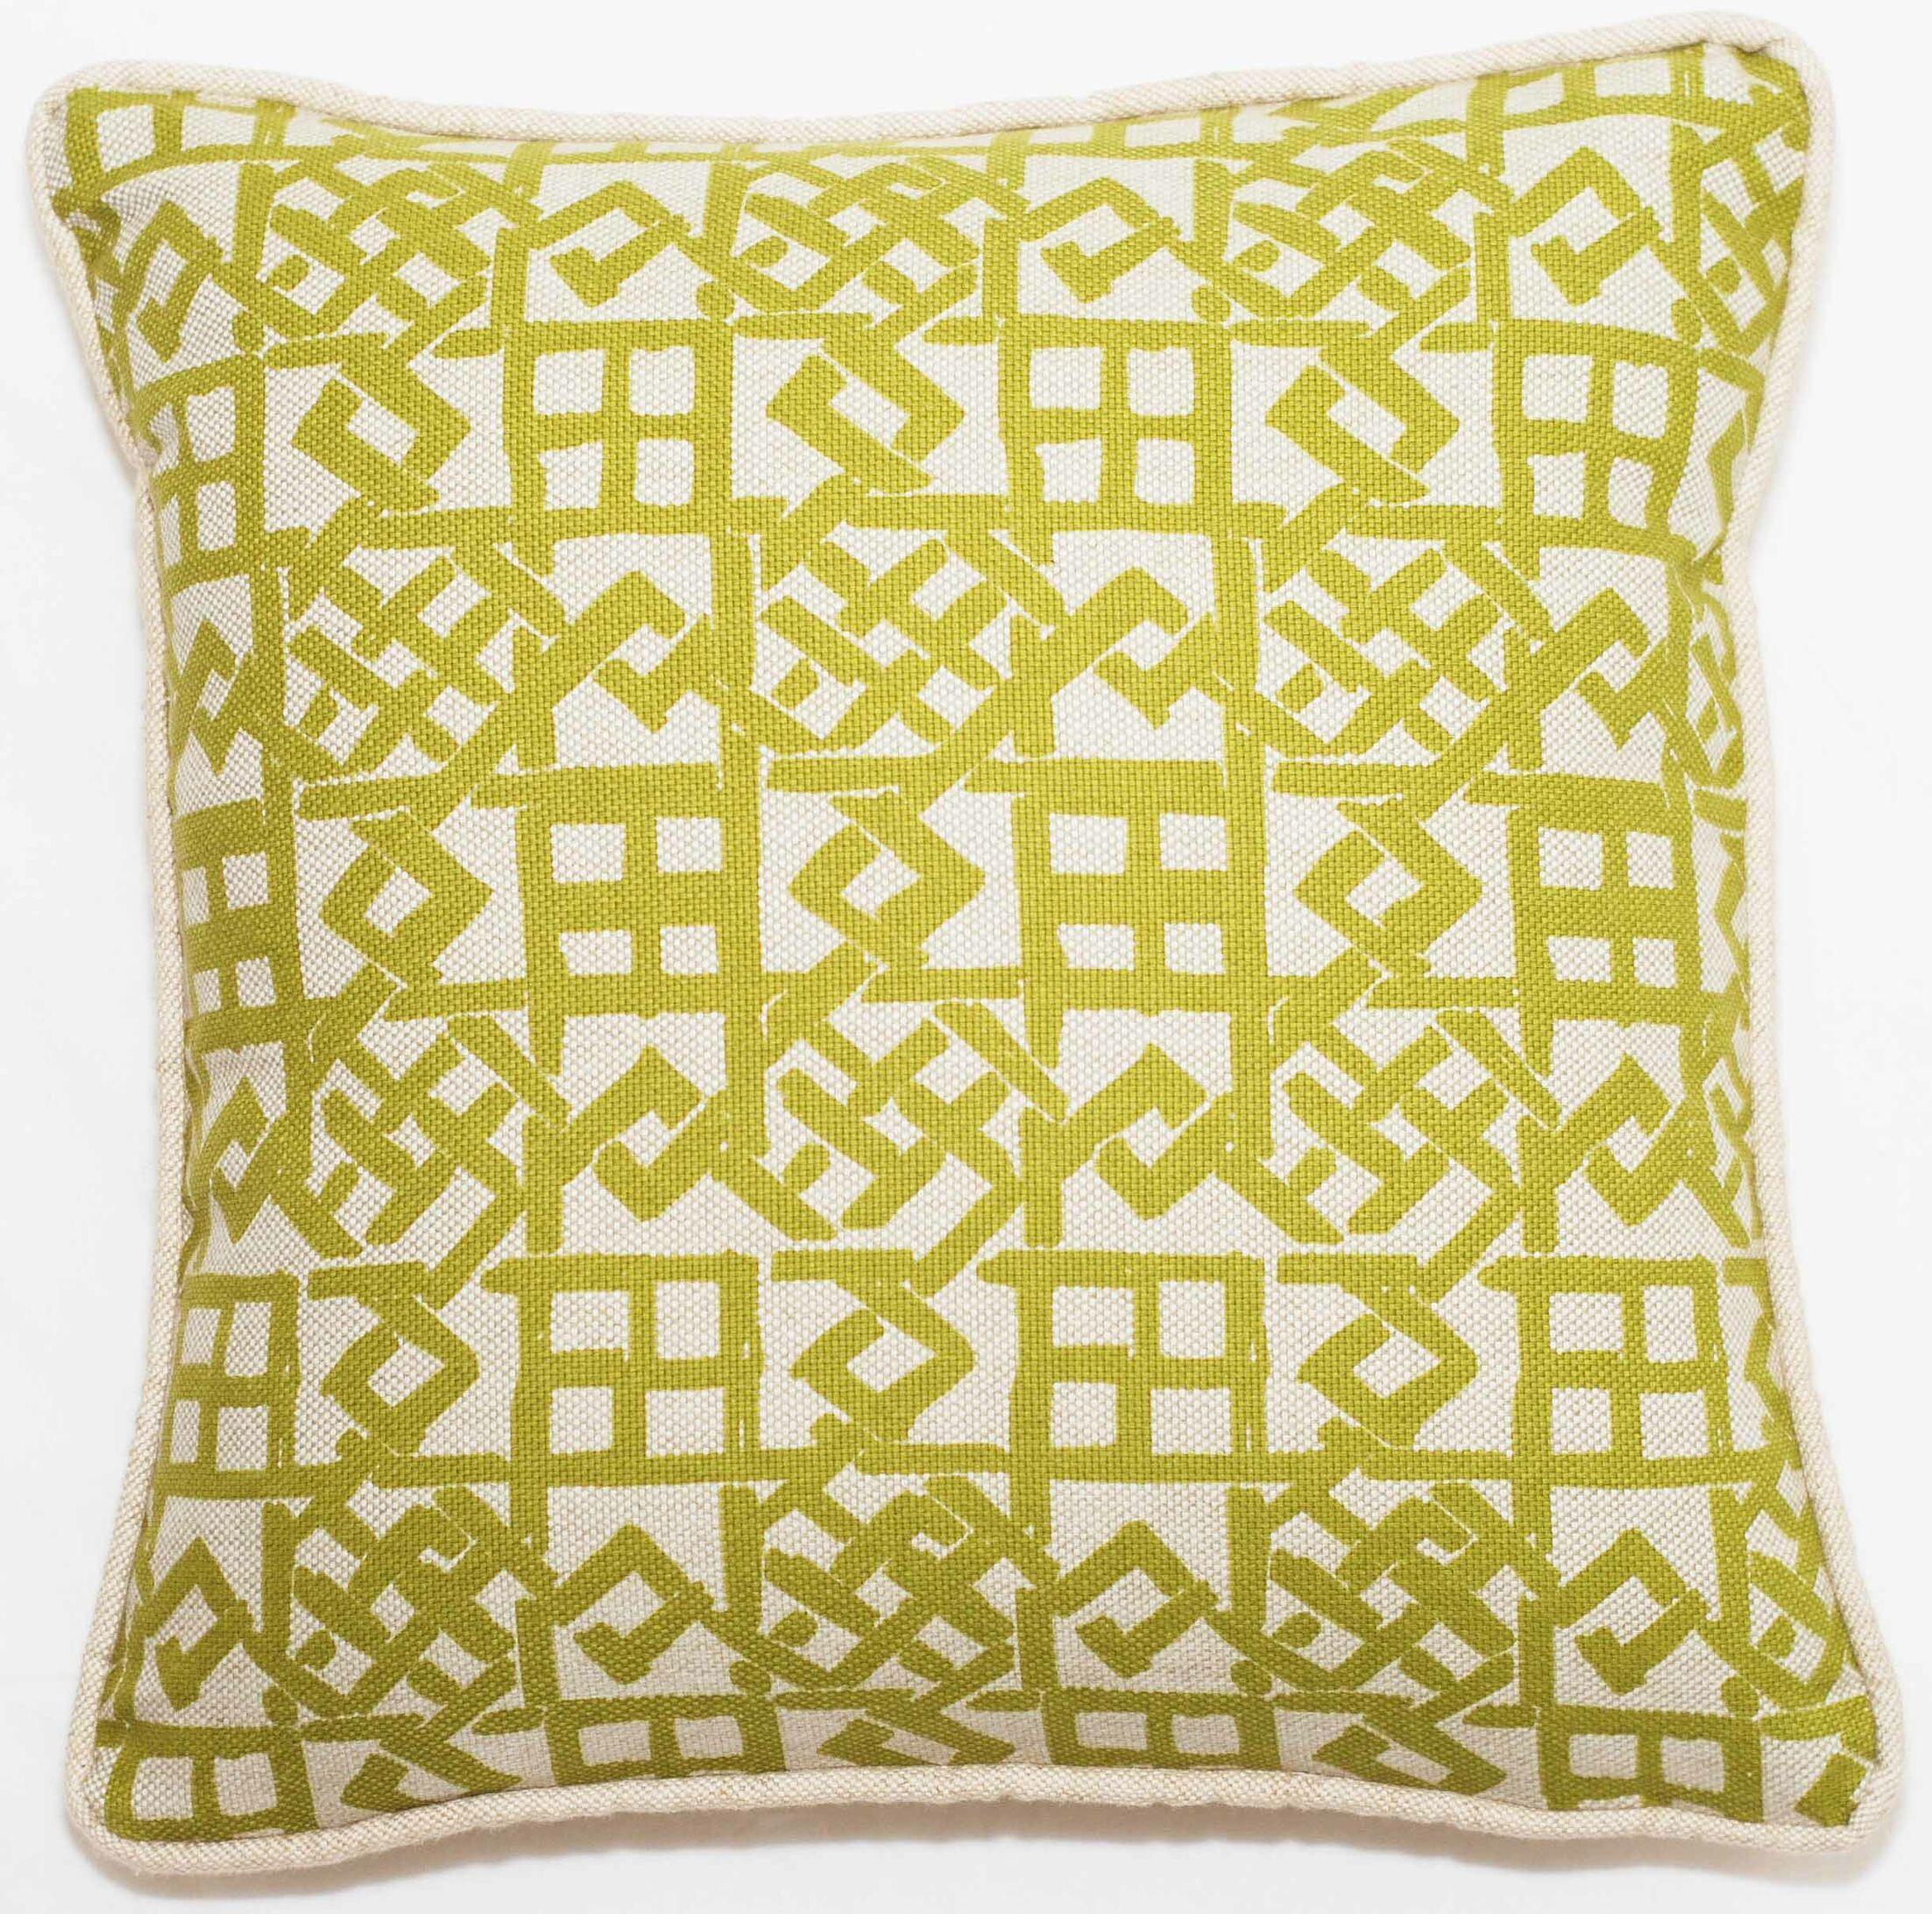 Modern Lattice Throw Pillow Color: Green, Size: 11